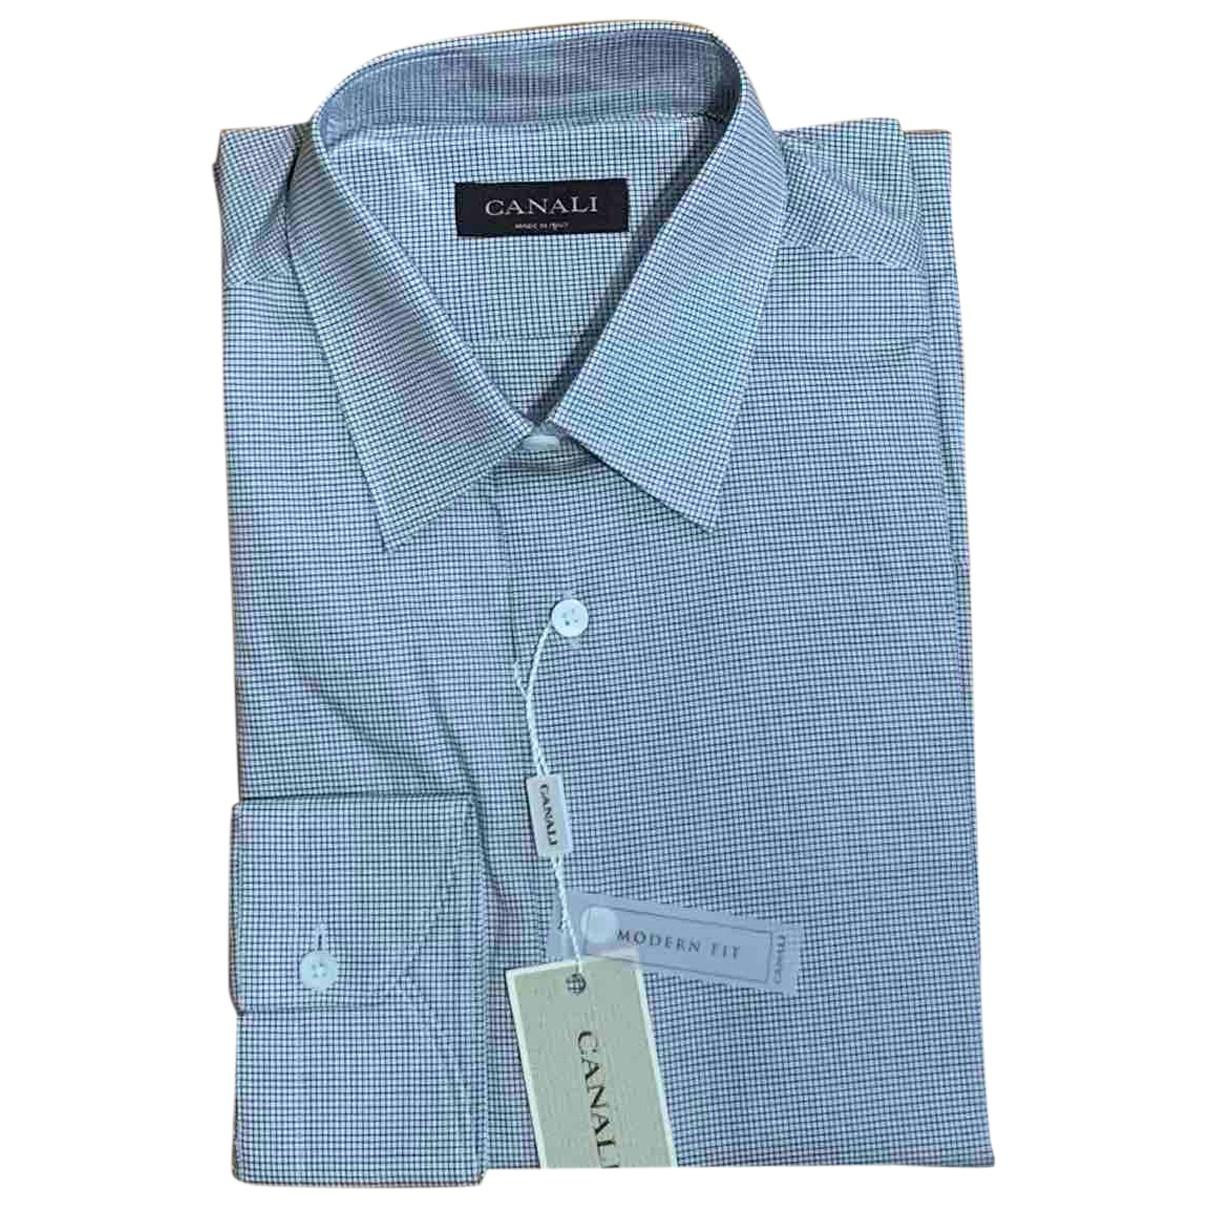 Canali N White Cotton Shirts for Men 40 EU (tour de cou / collar)